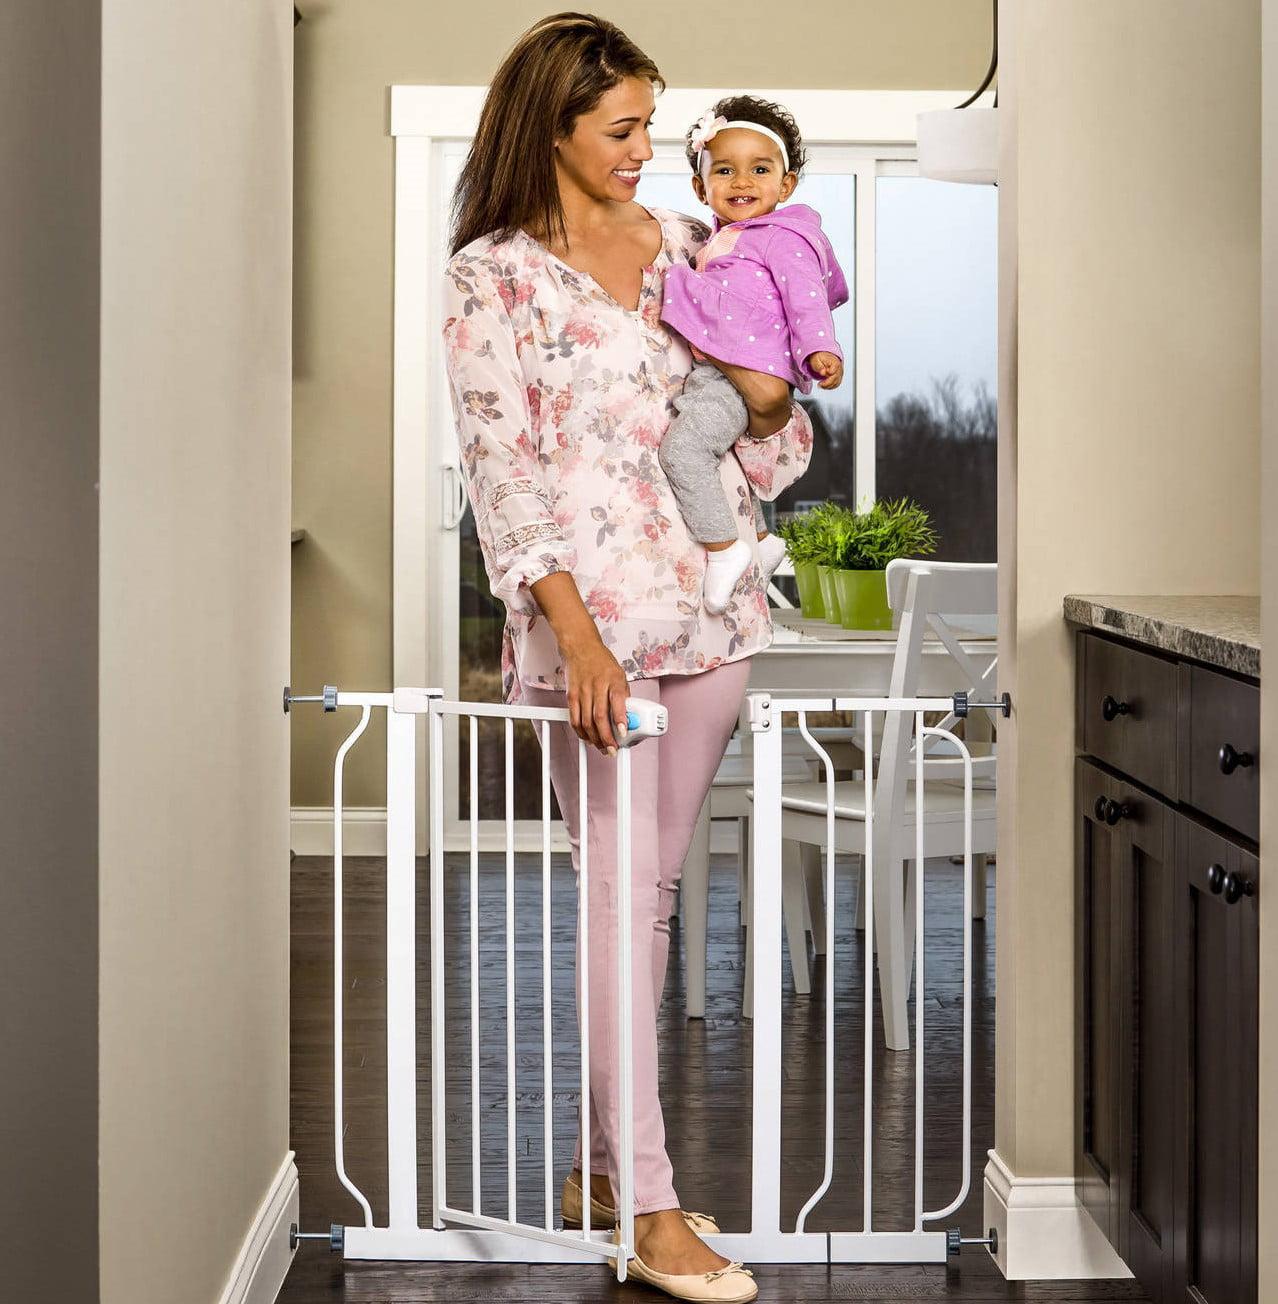 Regalo Extra Wide Baby Gate 29 39 With Walk Through Door